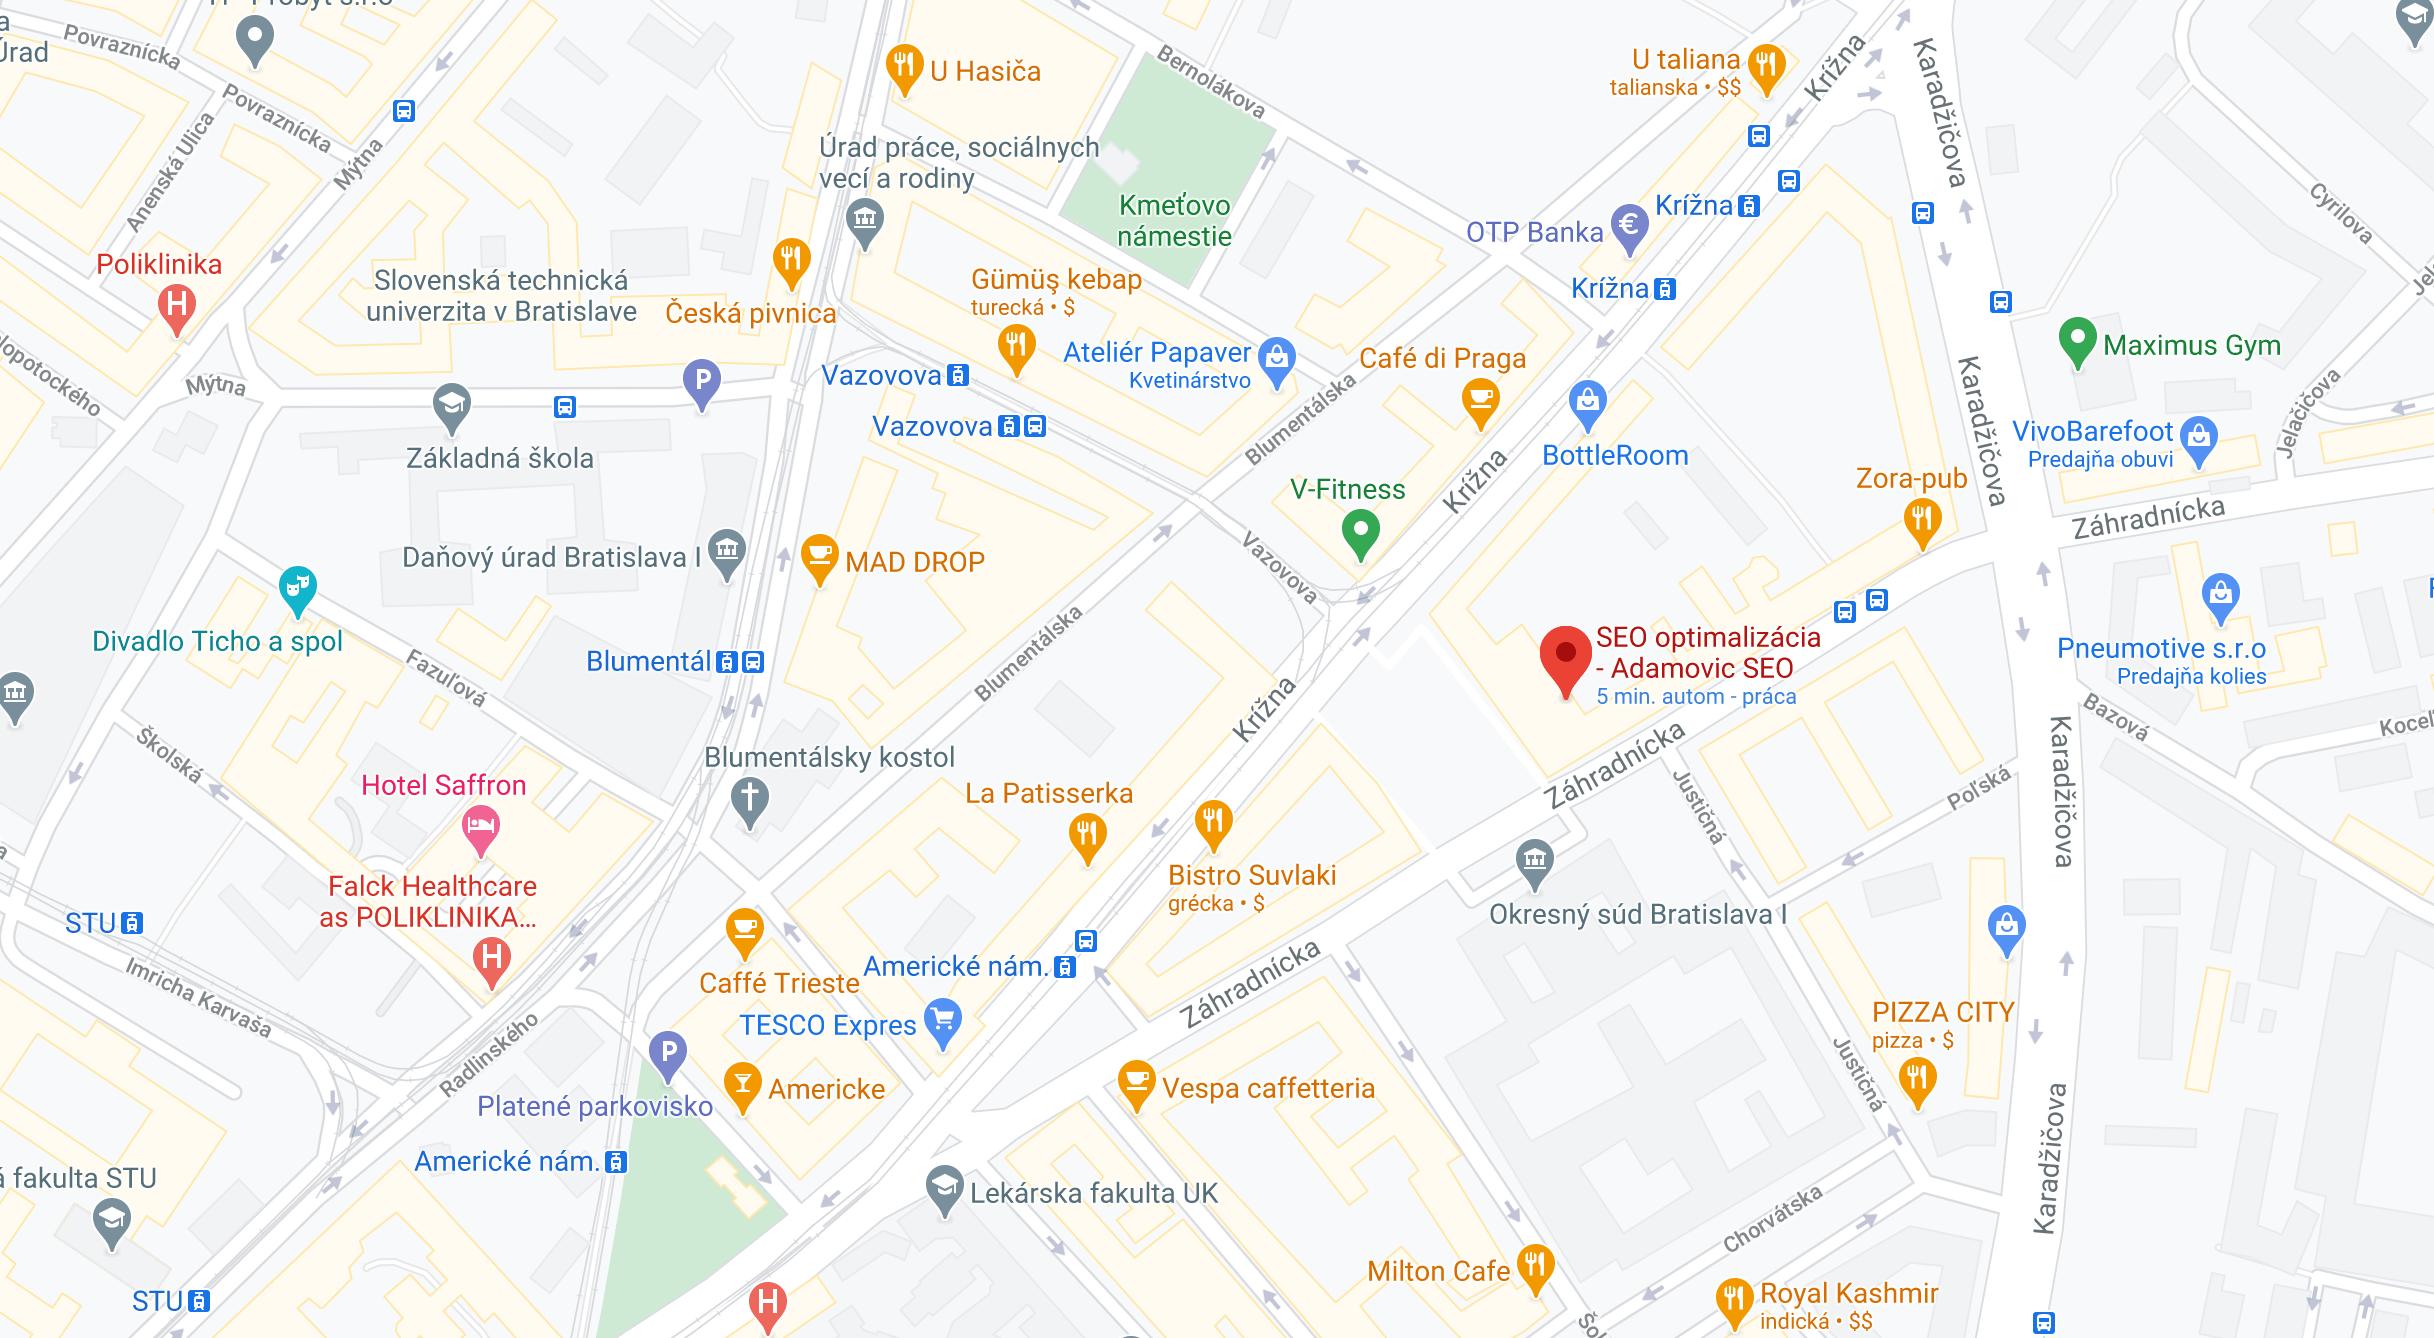 mapa adamovic seo